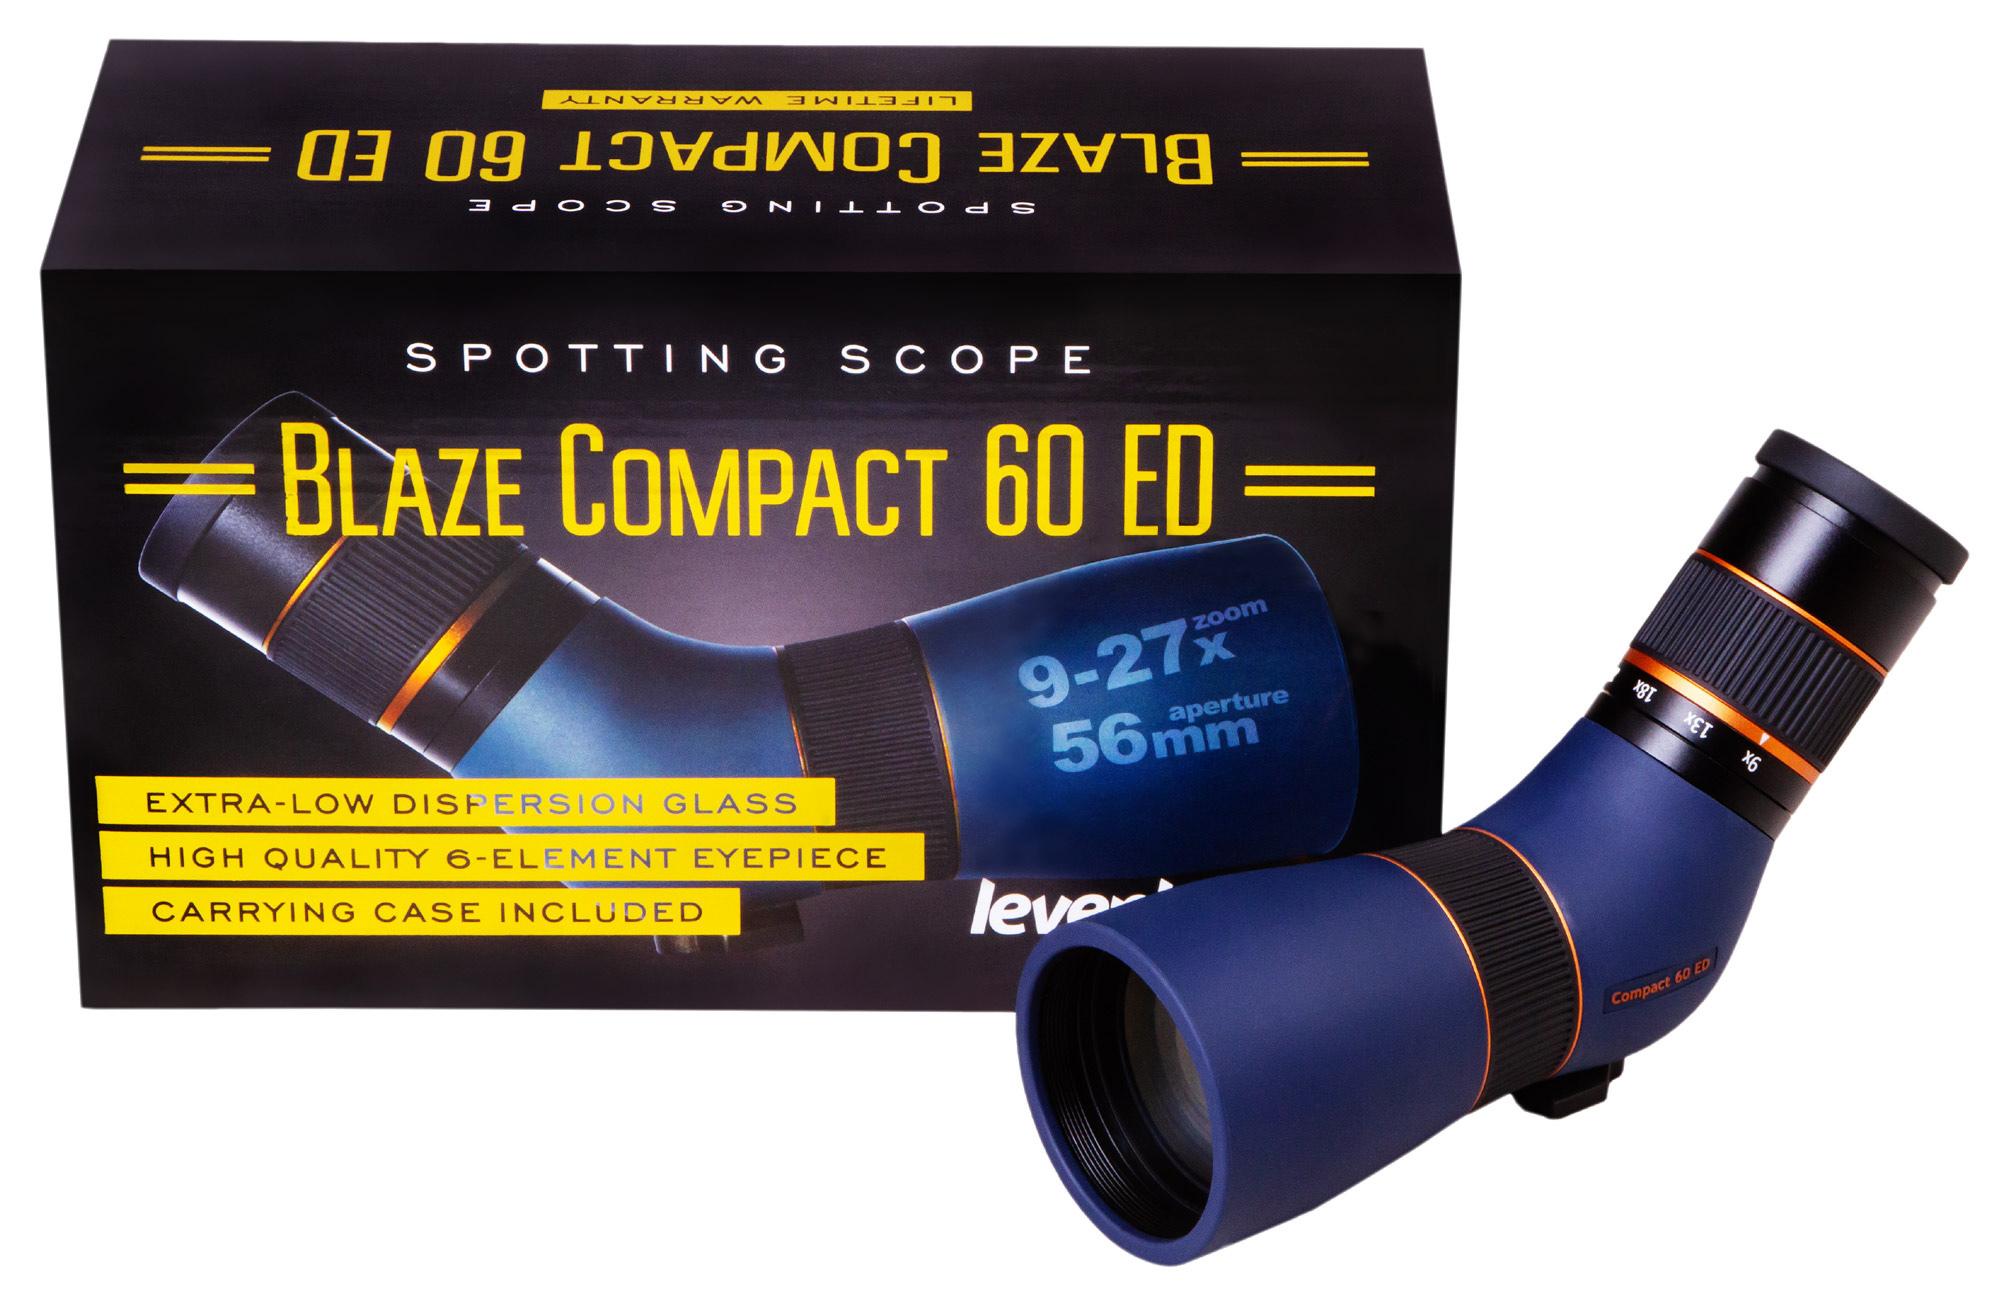 74162_levenhuk-spotting-scope-blaze-compact-60-ed_15.jpg